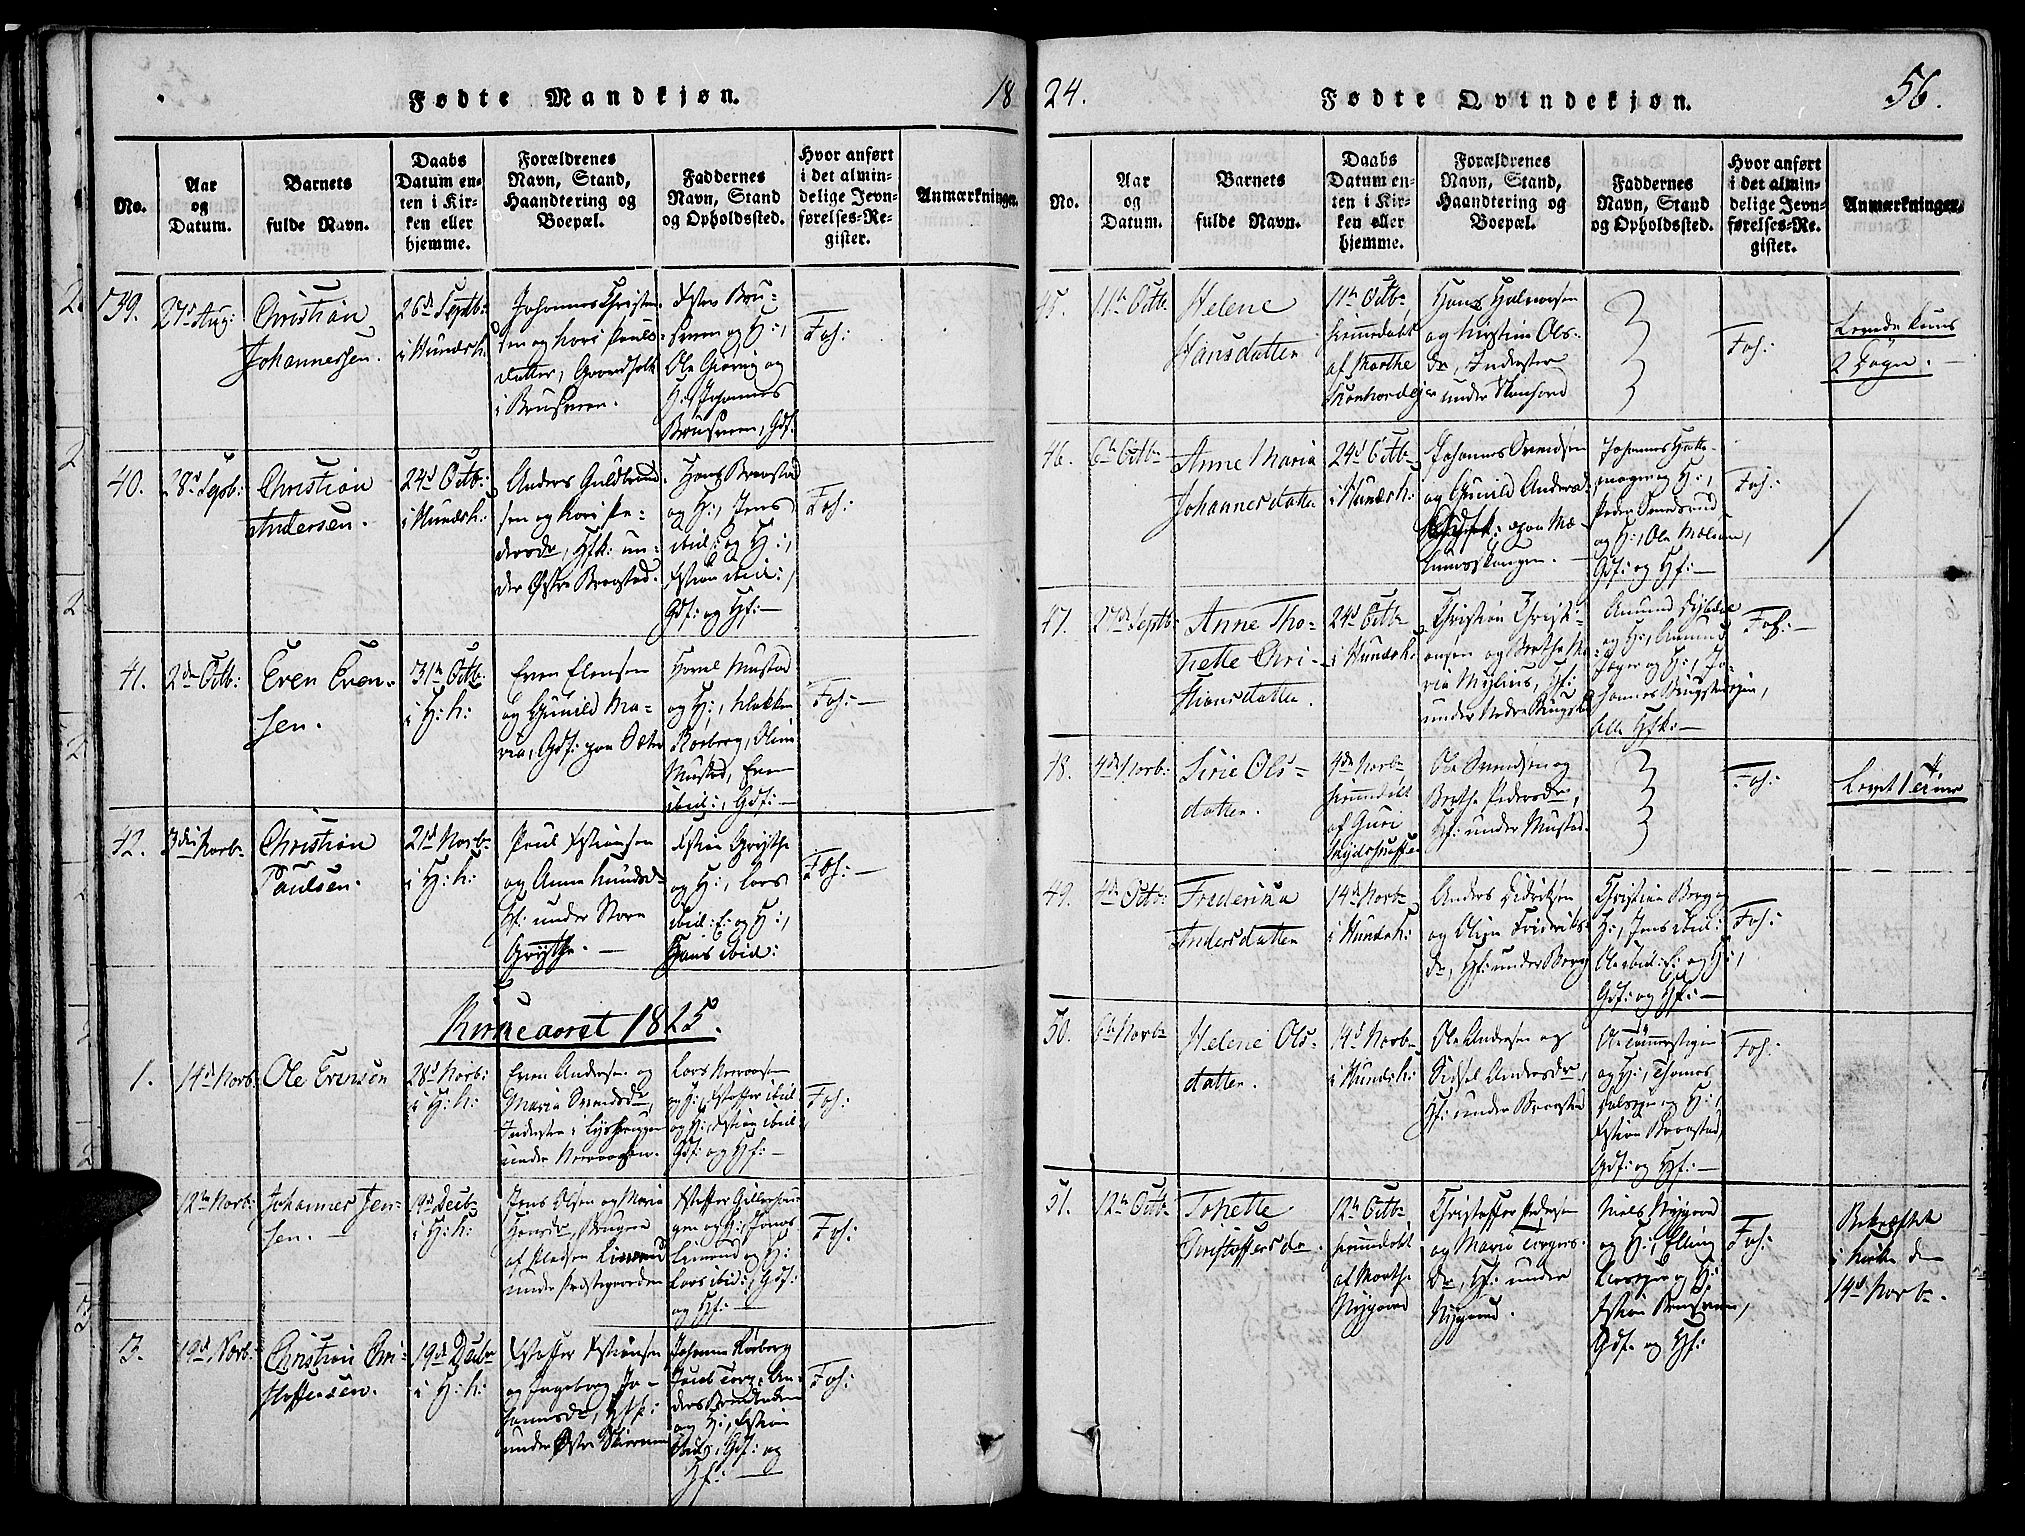 SAH, Vardal prestekontor, H/Ha/Haa/L0004: Ministerialbok nr. 4, 1814-1831, s. 56